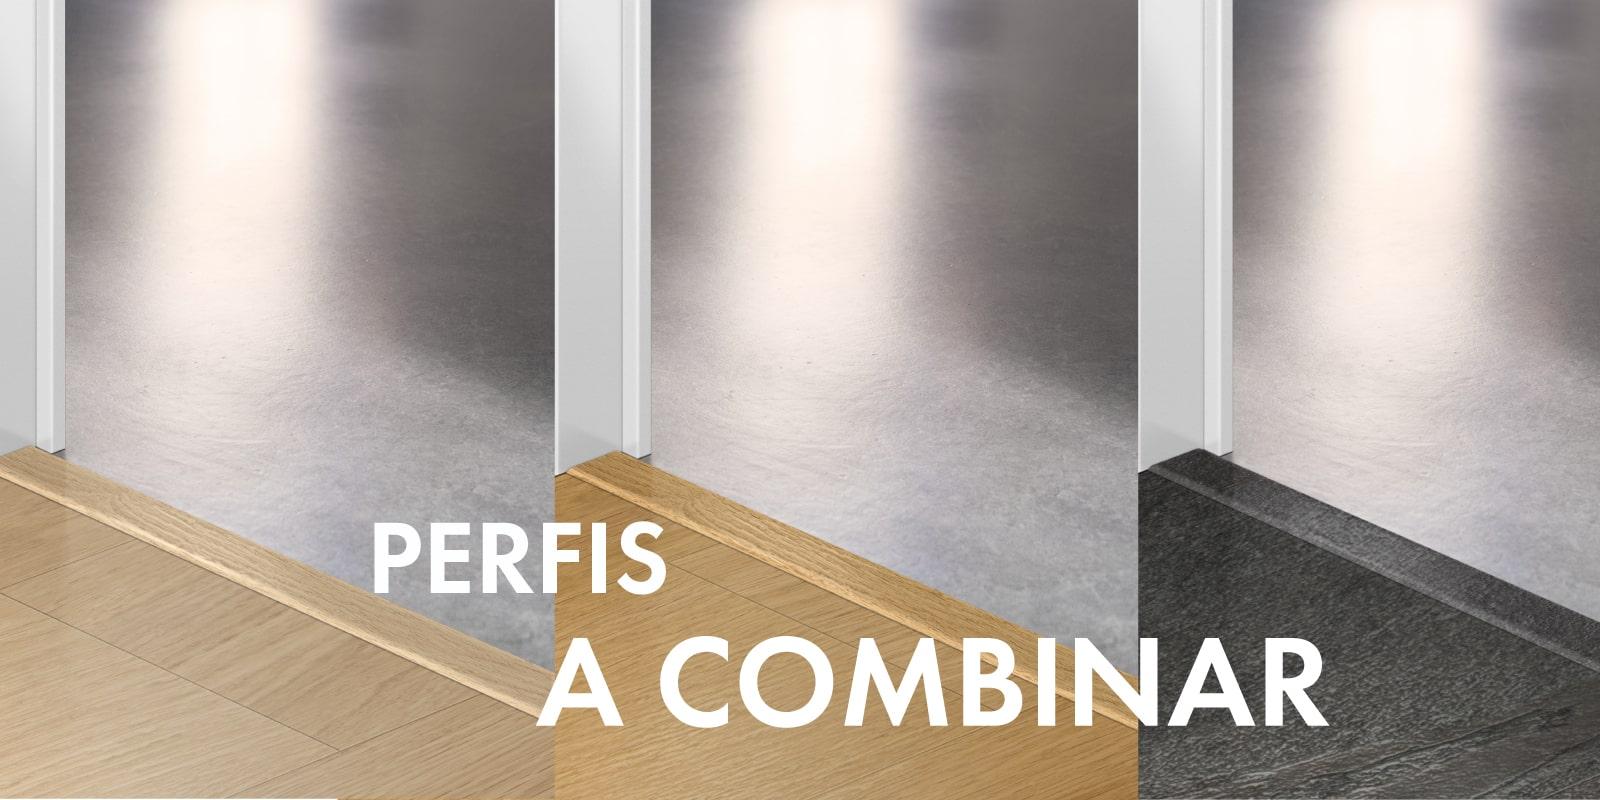 perfis-de-varias-cores_1_.jpg